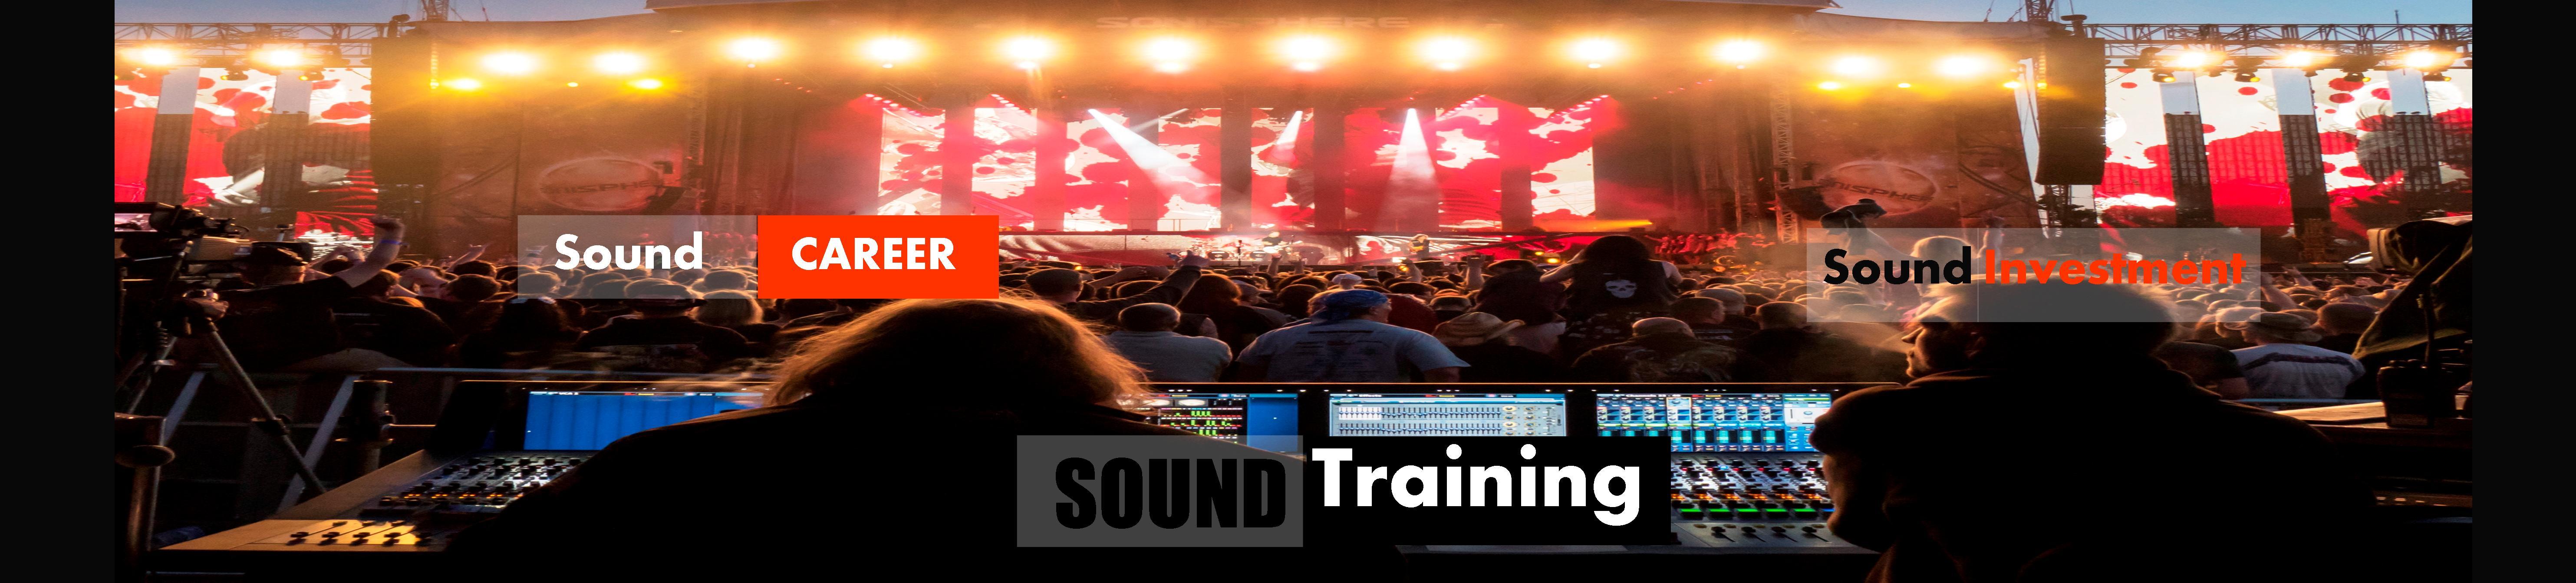 Sound-Investment-slide